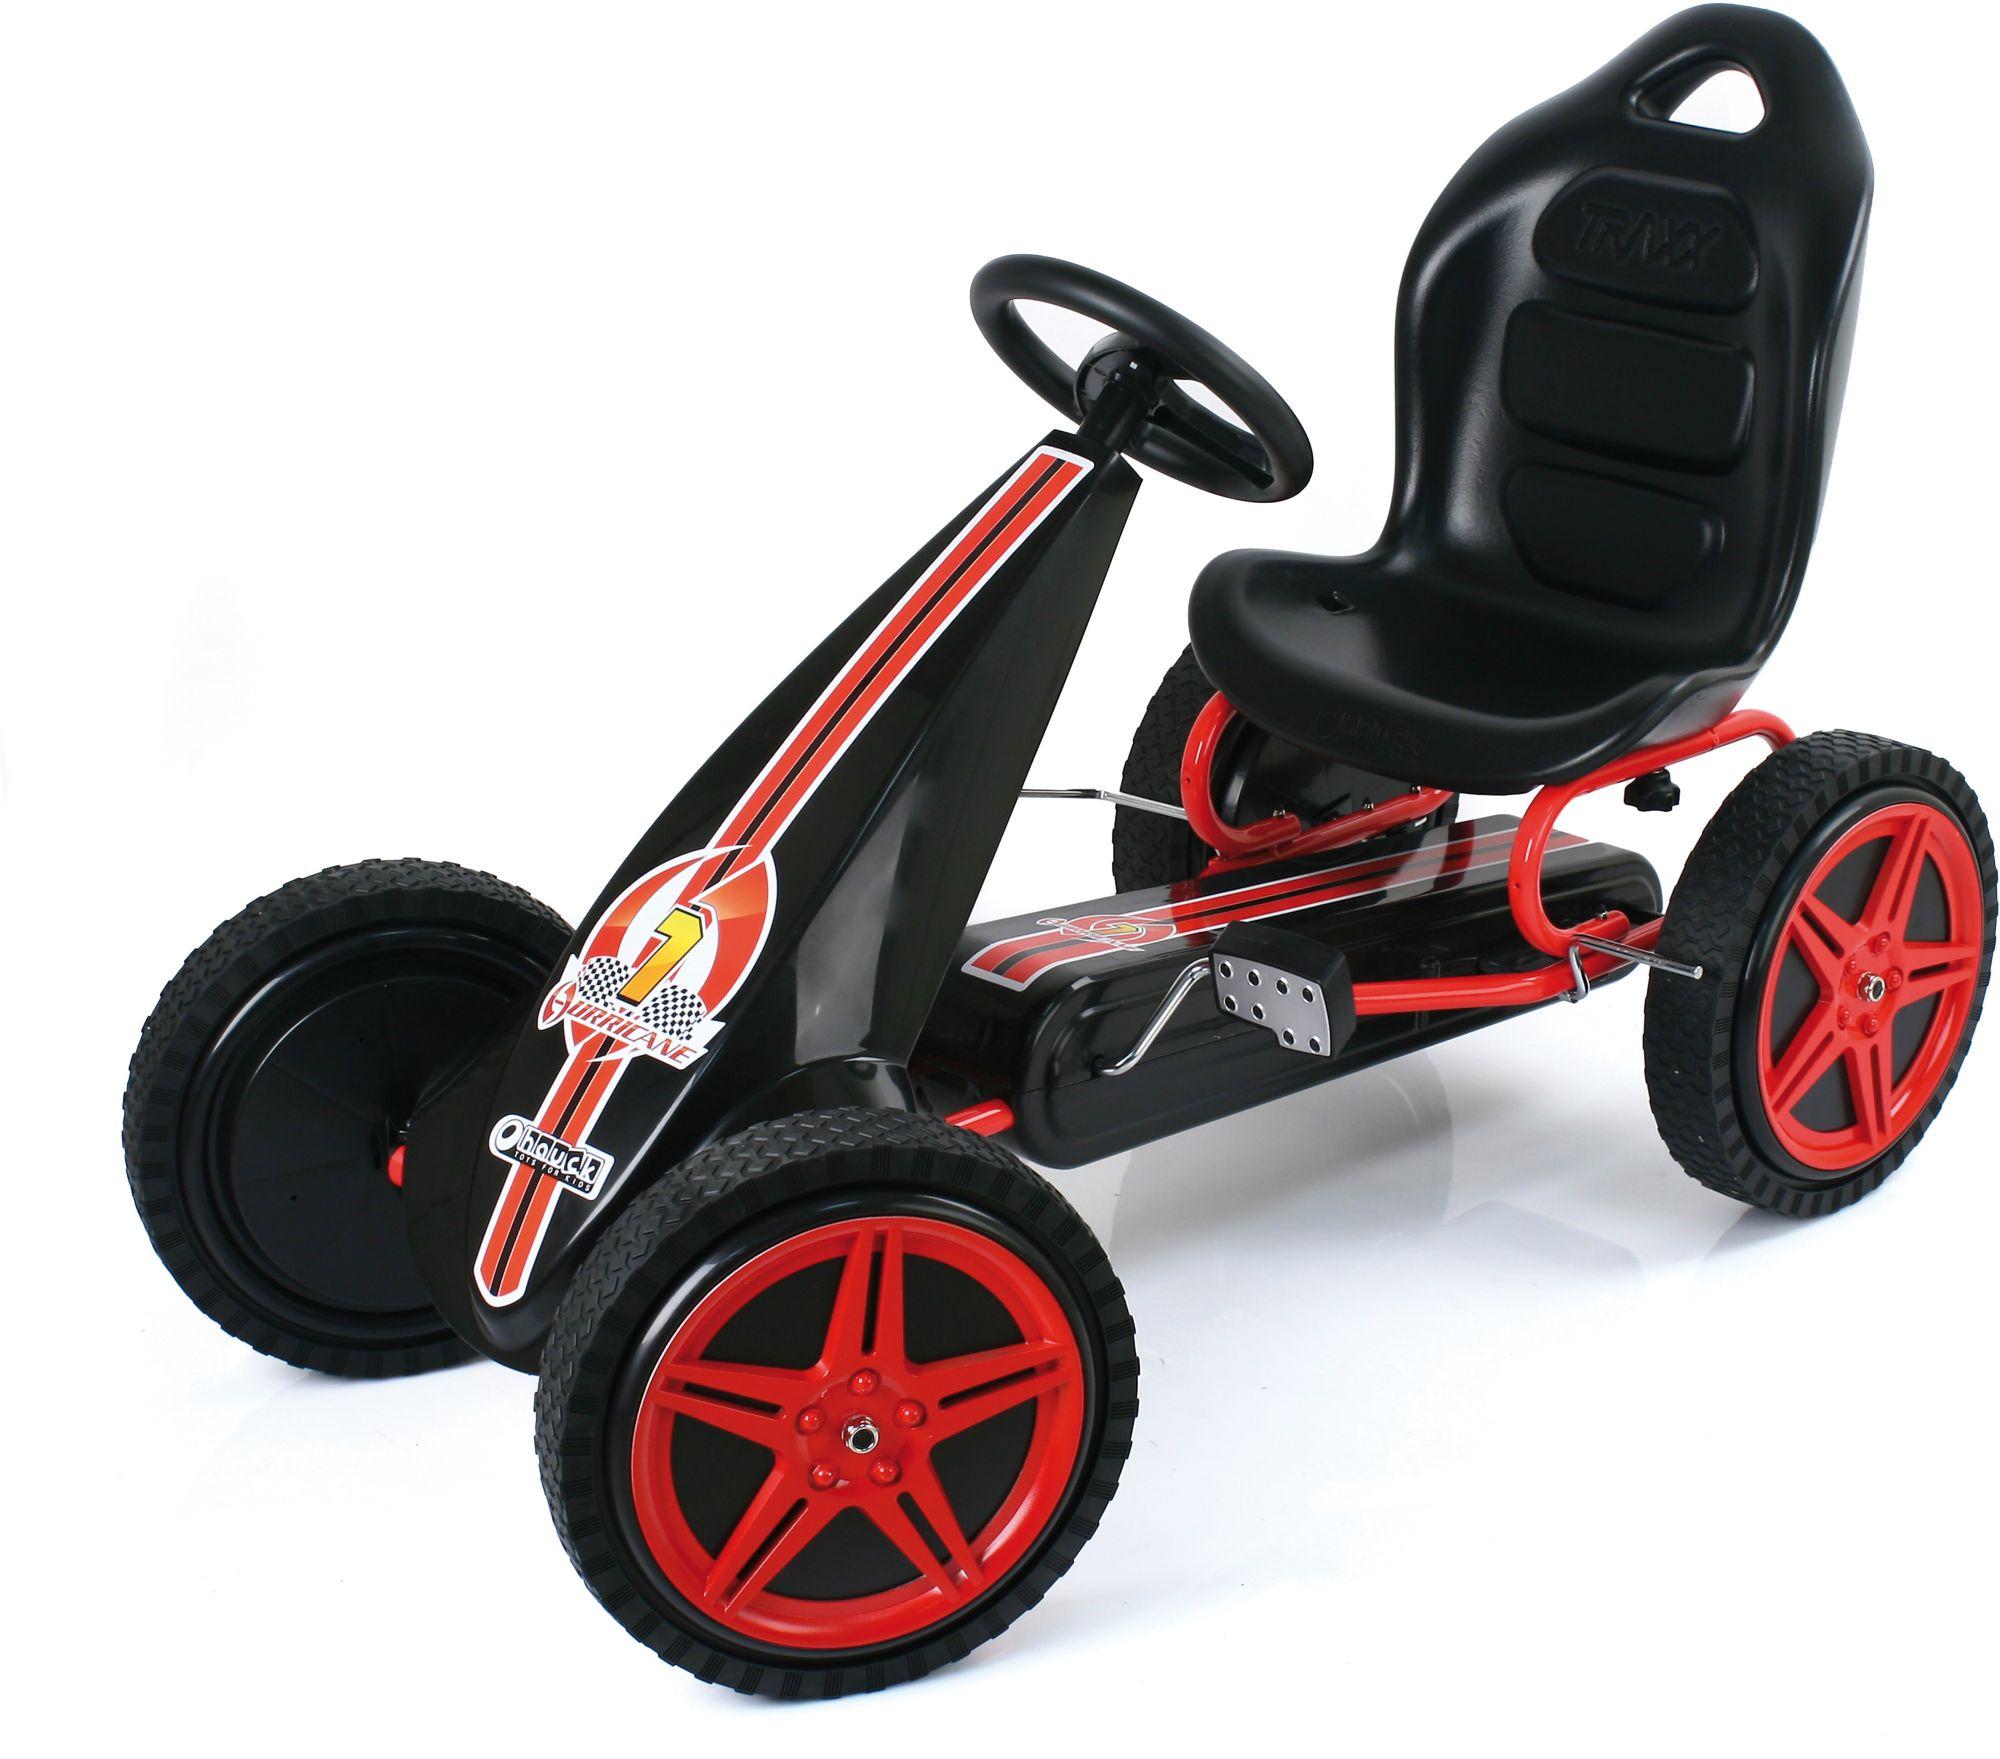 HAUCK TOYS FOR KIDS hauck TOYS FOR KIDS Go-Kart, »Hurricane, Red«